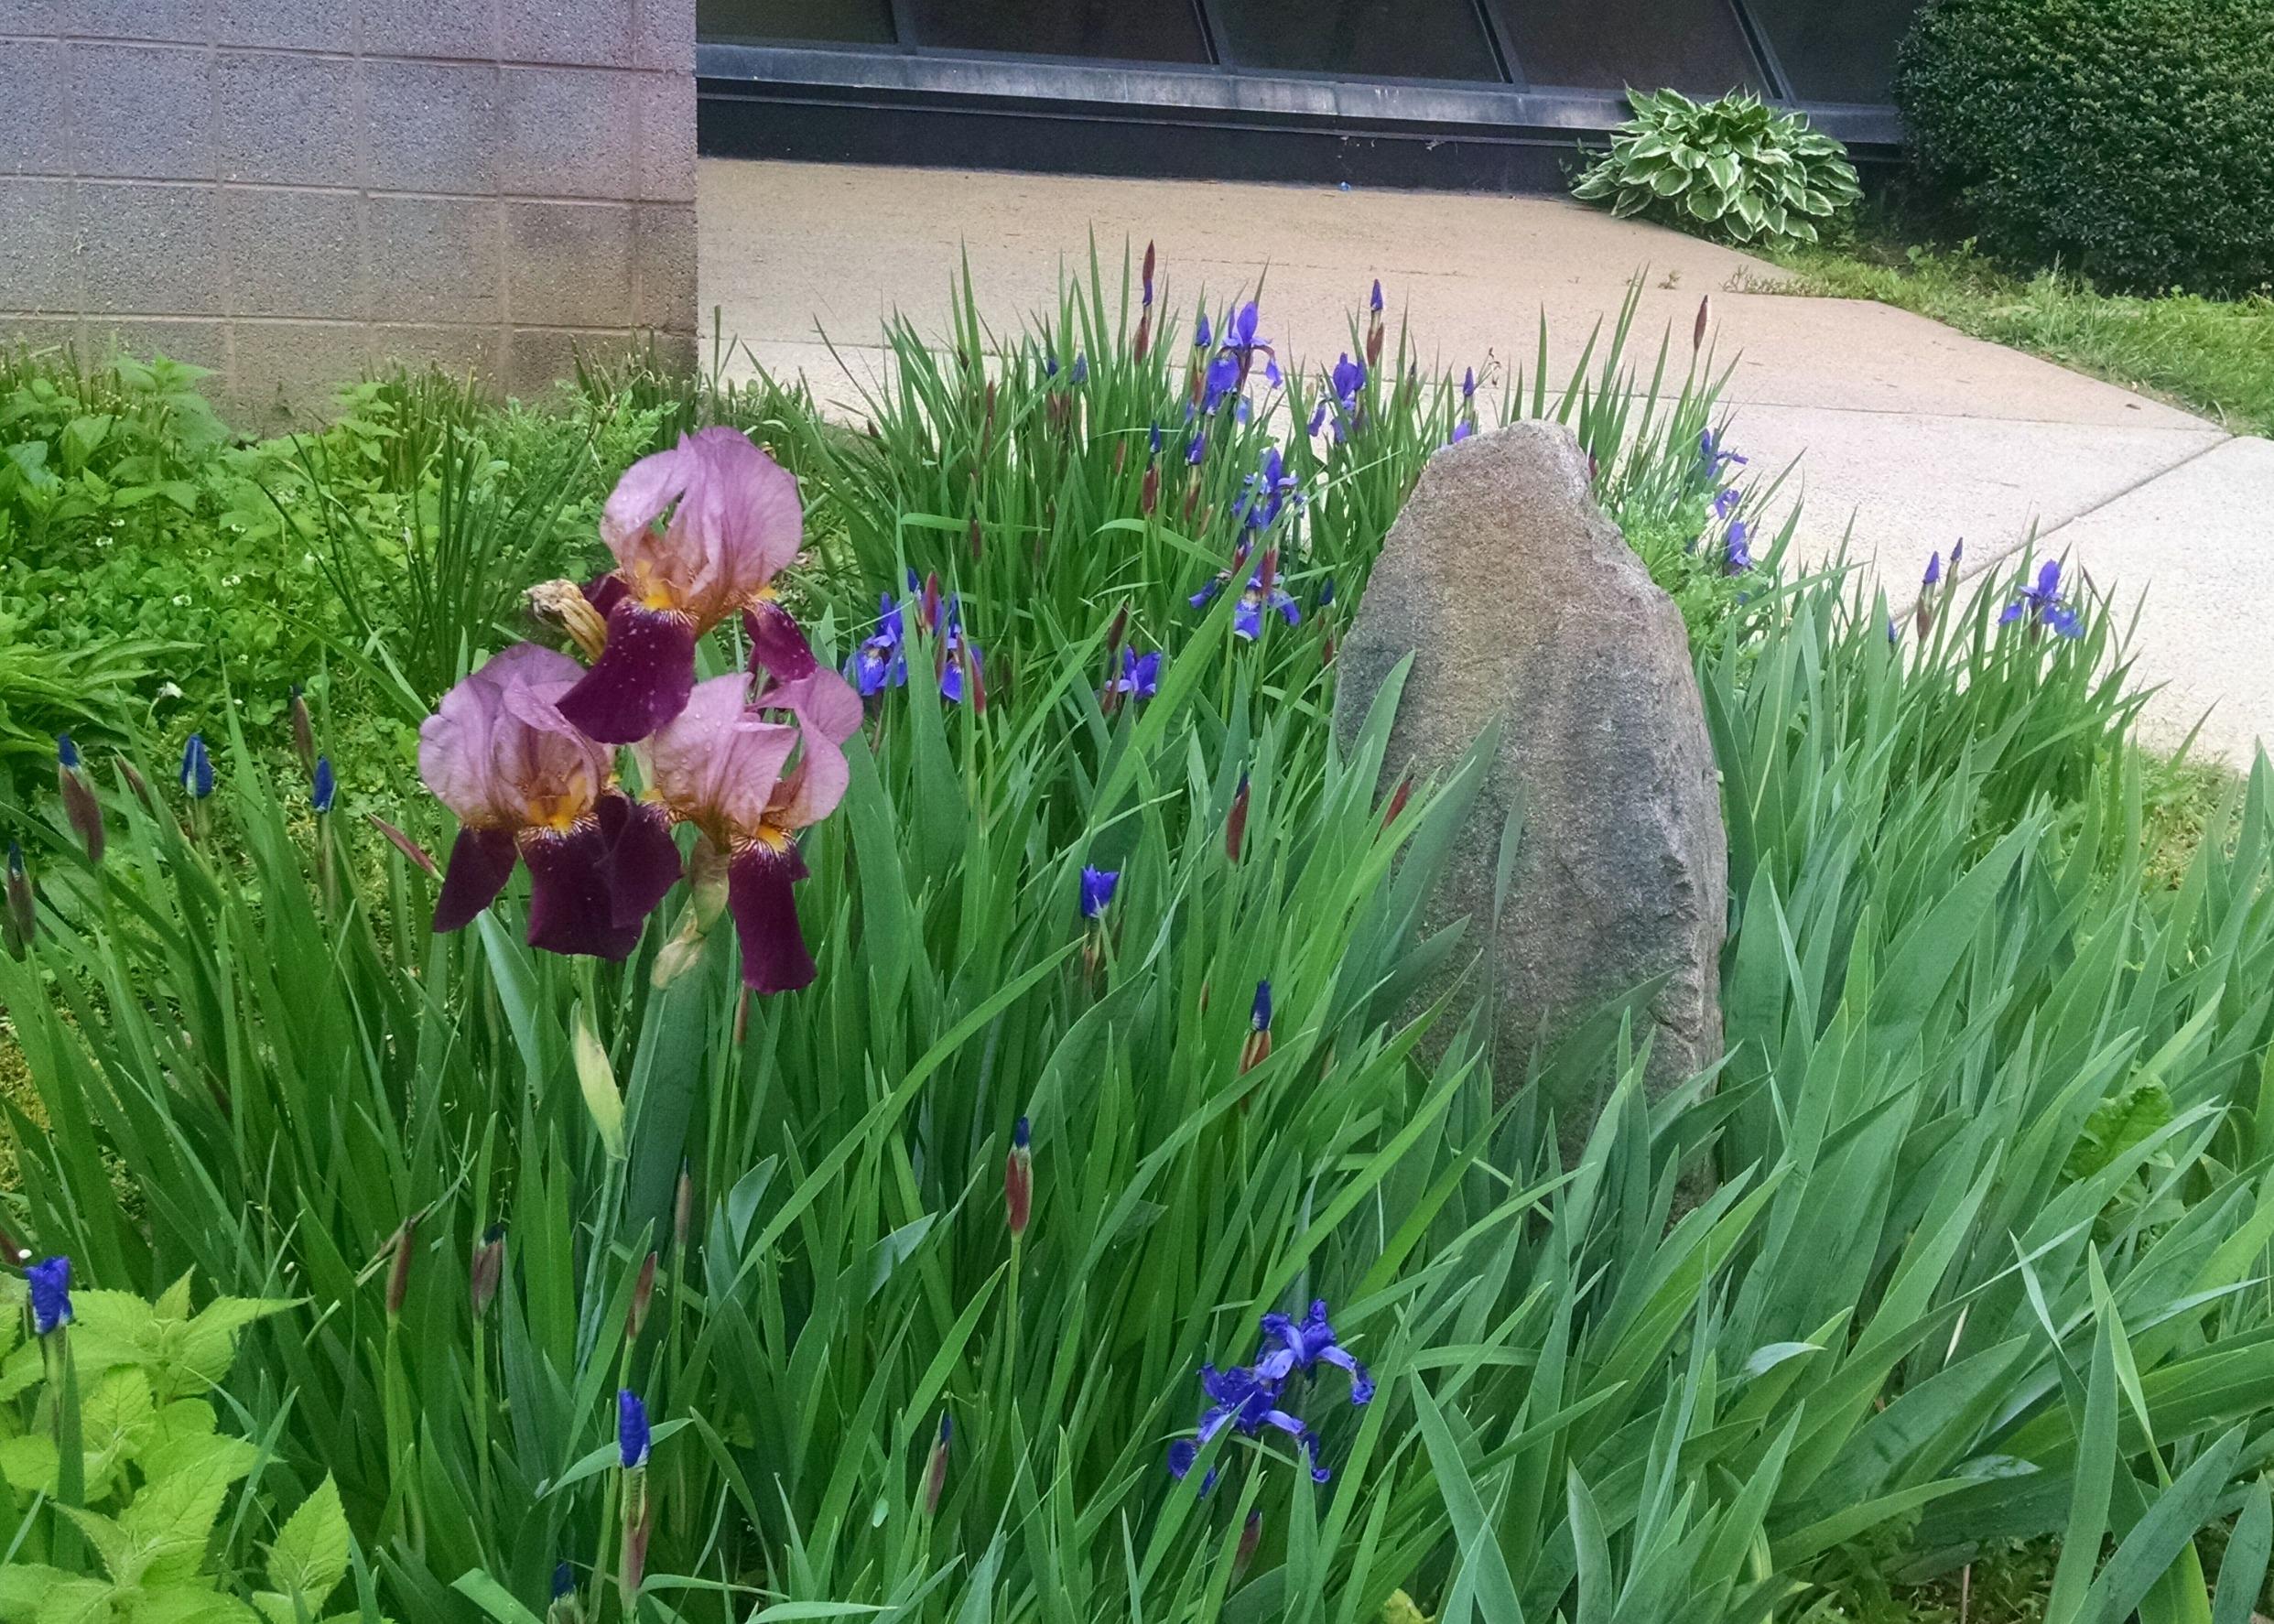 Pretty Purple flowers in the rain at the REC center